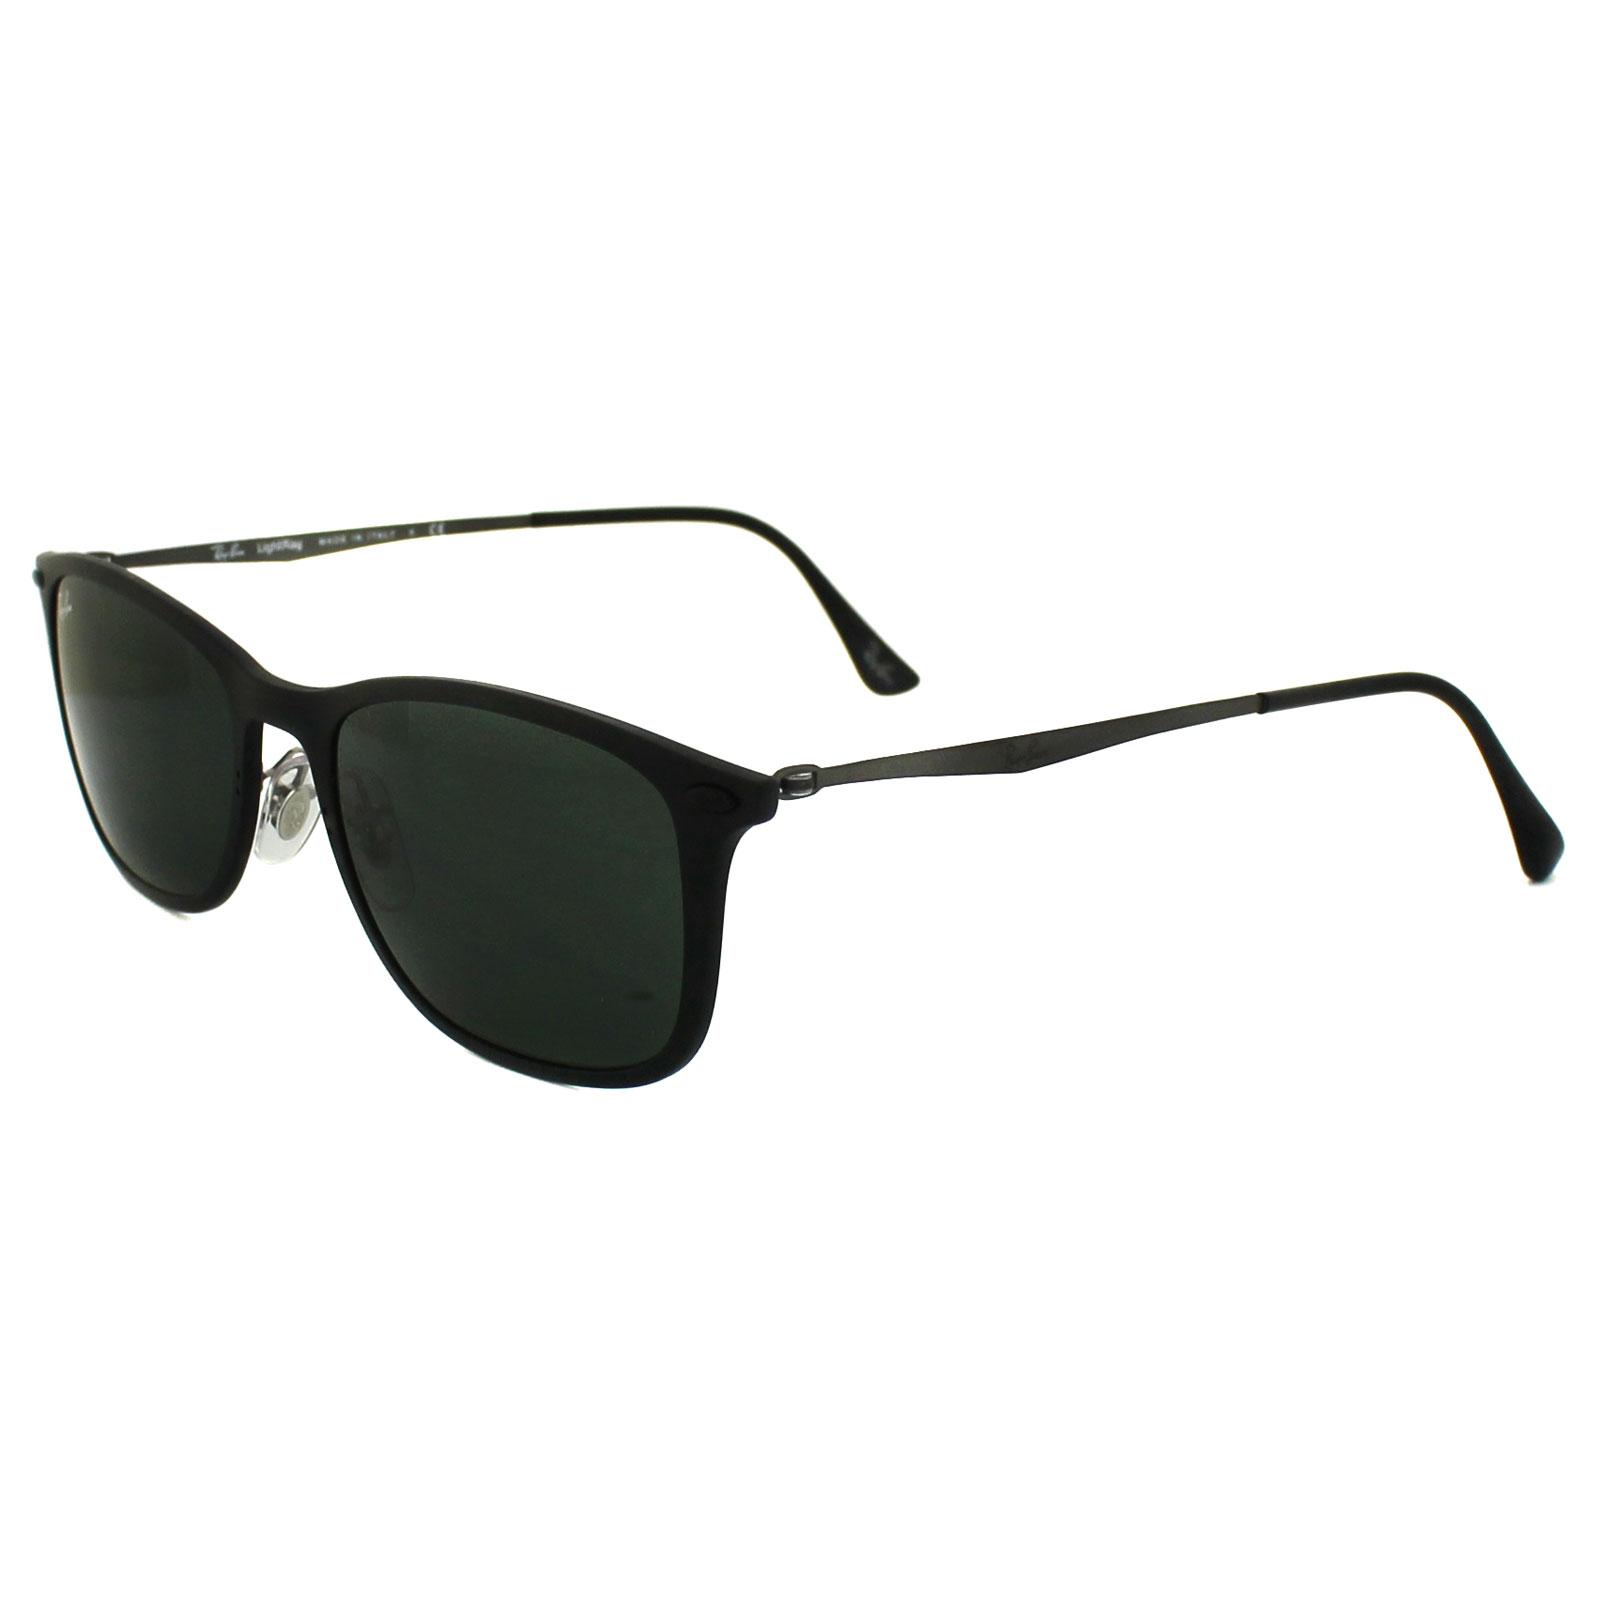 b414c4eb4825a Sentinel Ray-Ban Sunglasses New Wayfarer Light Ray 4225 601S71 Black   Grey  Green